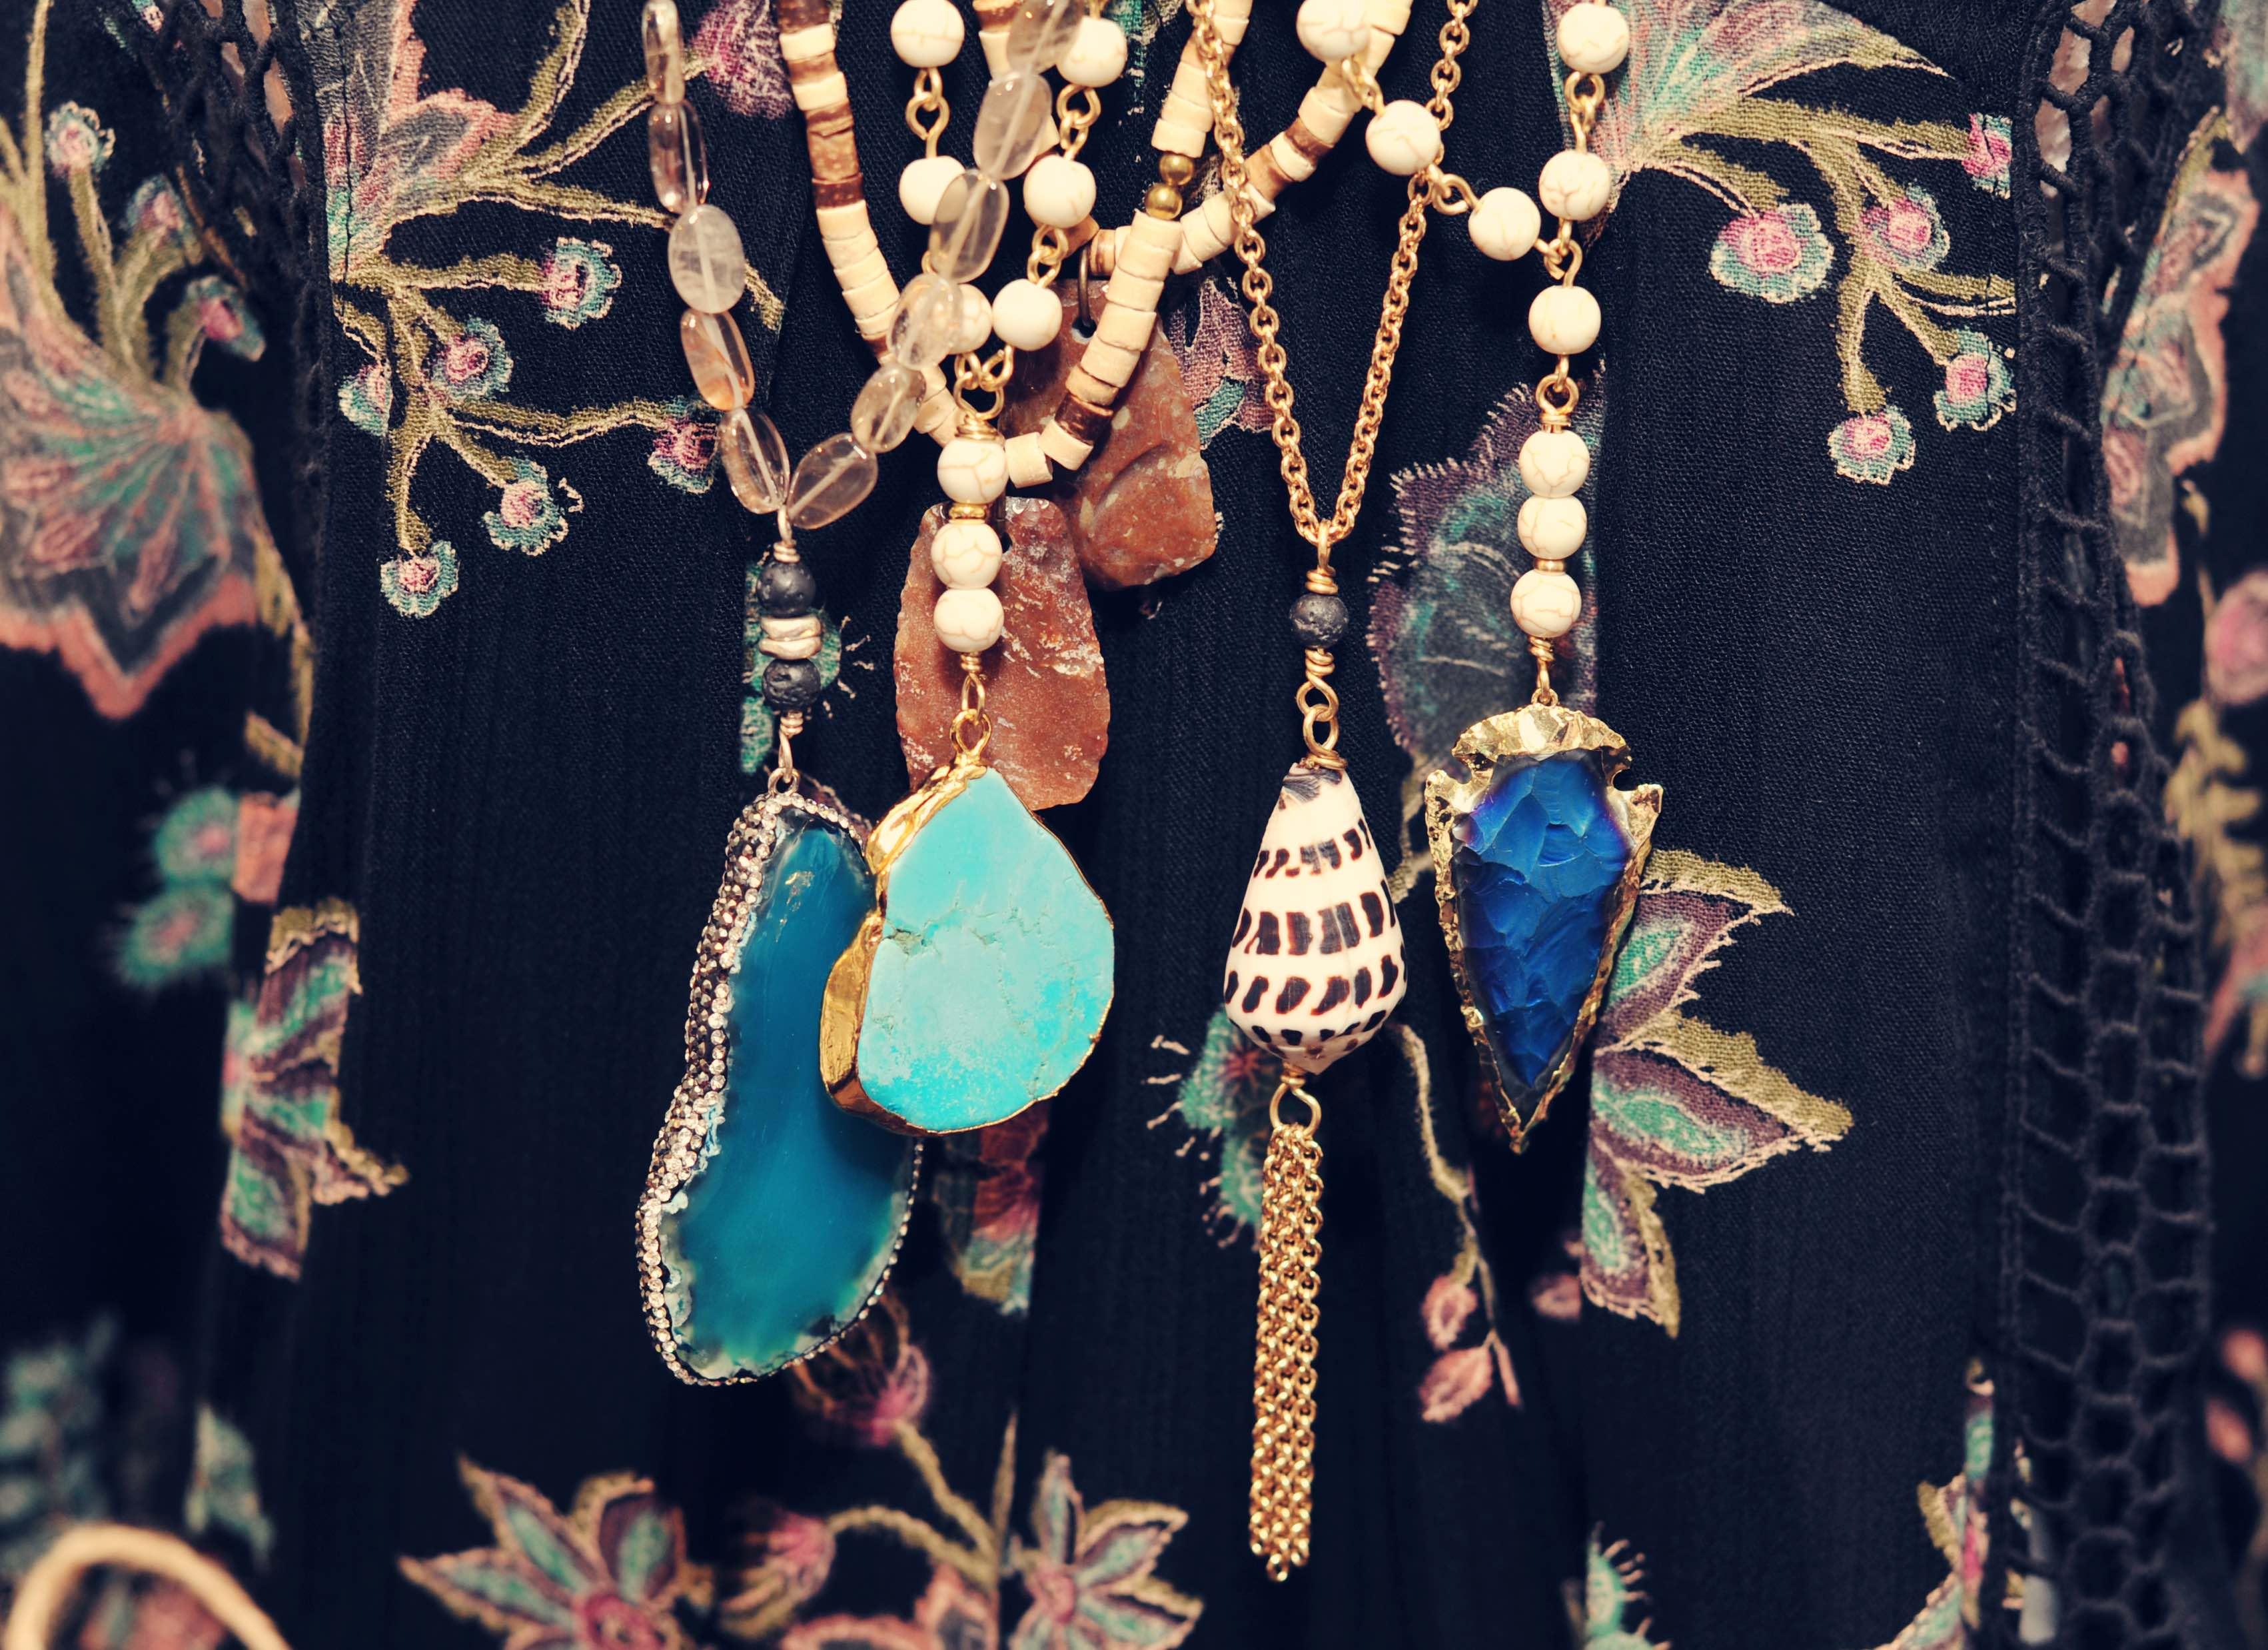 quin sharp jewelry